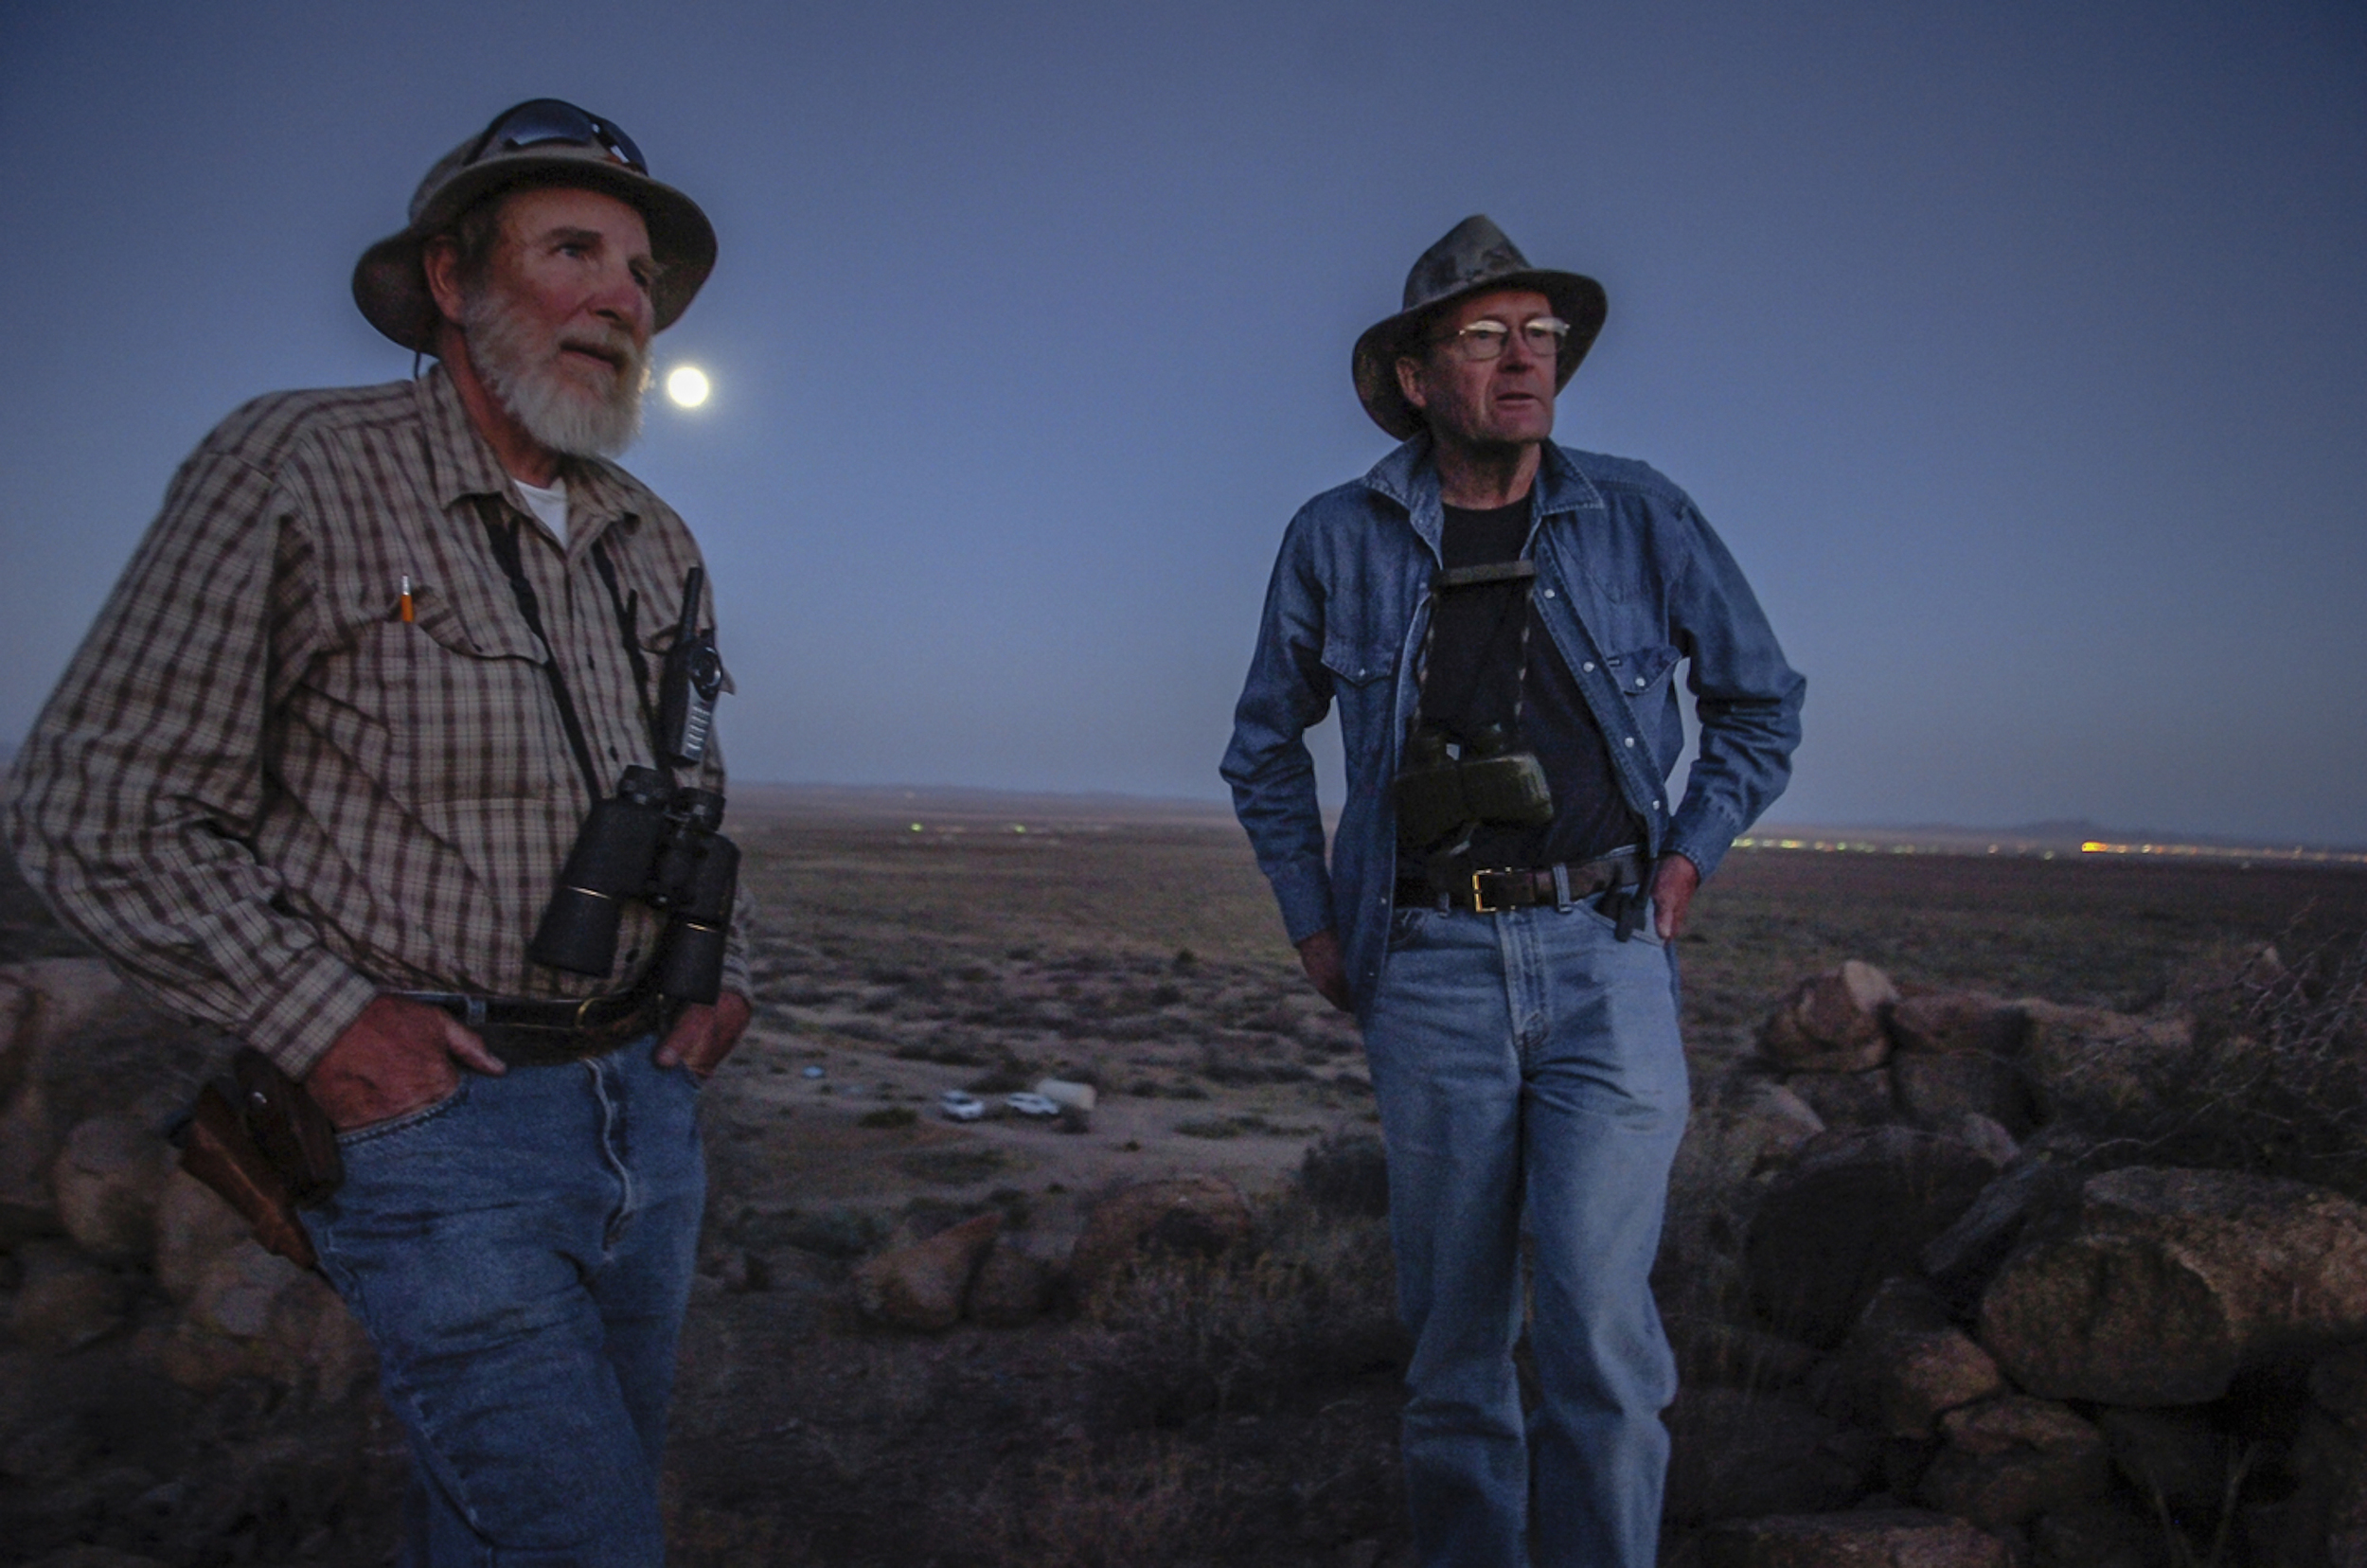 Minutemen in New Mexico